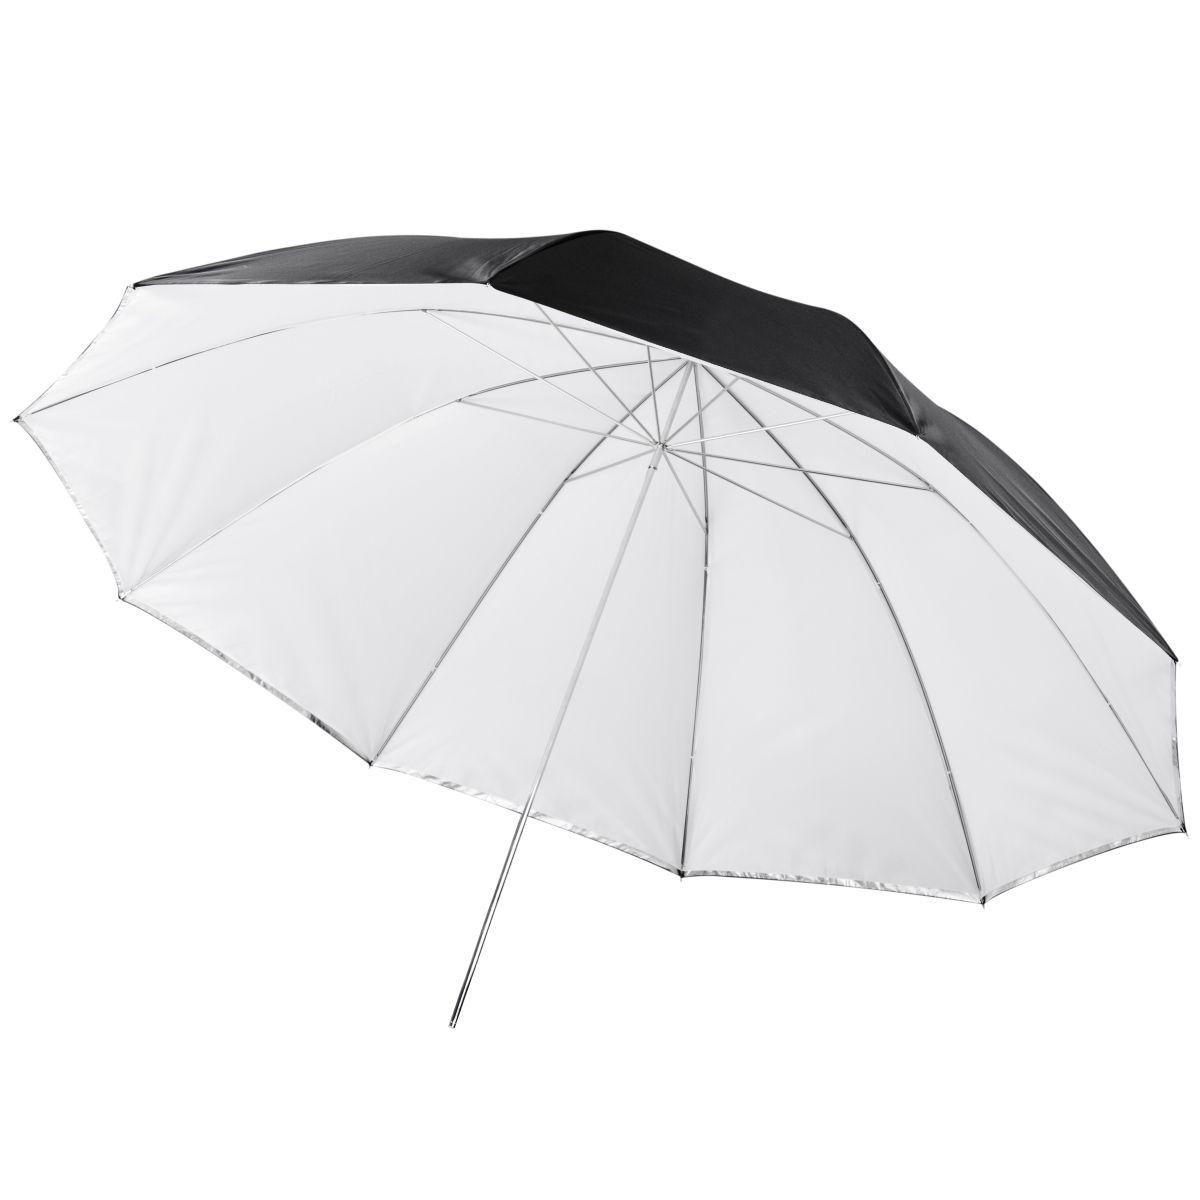 Walimex 2in1 Reflex & Transl. Umbrella white 150cm